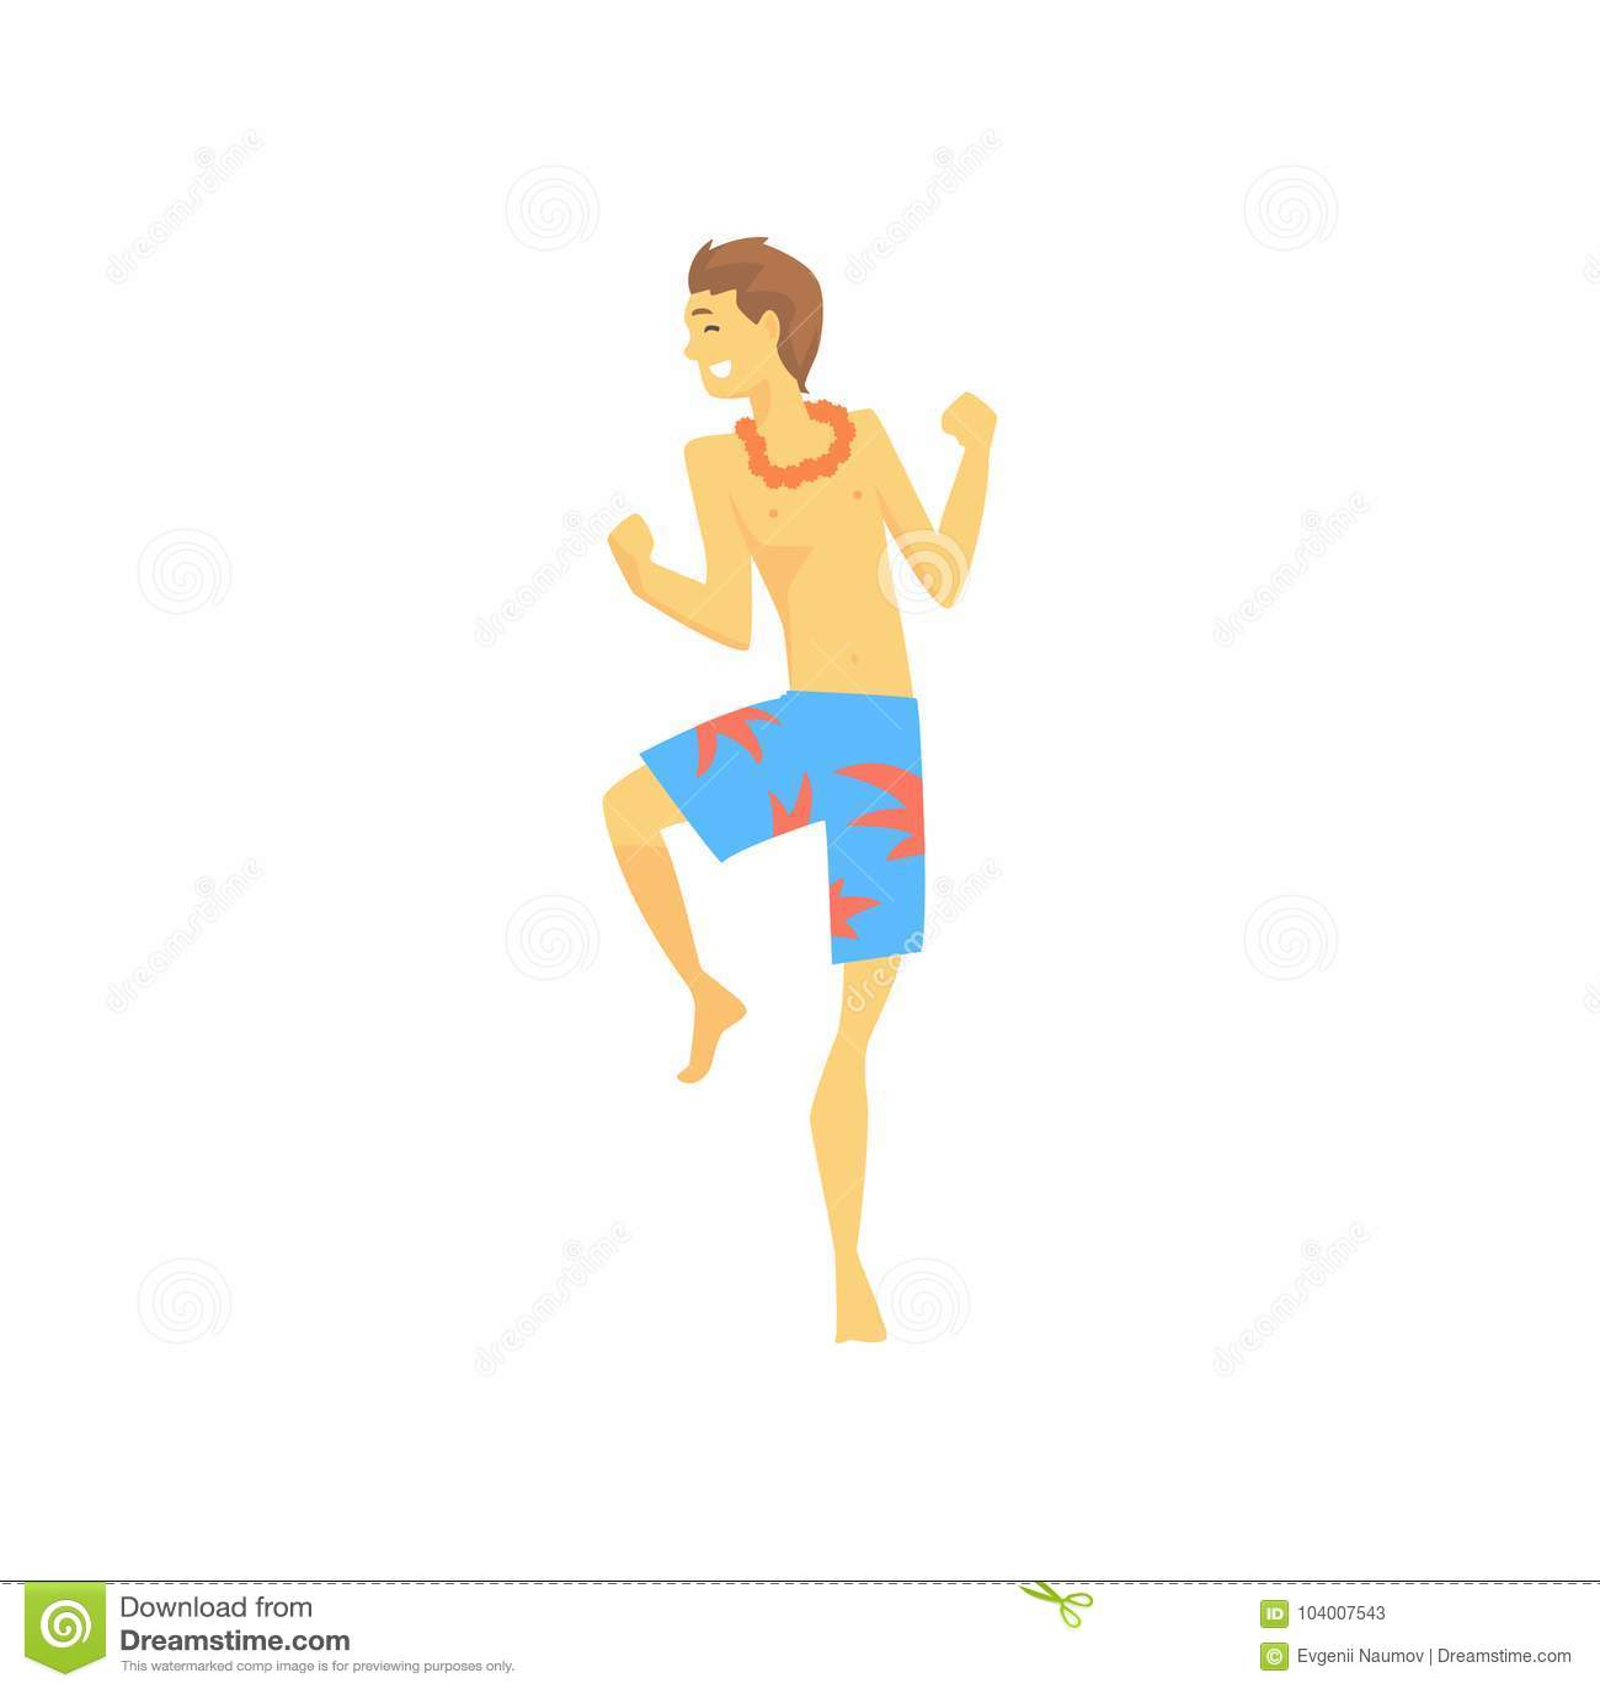 Man in hawaiian lei with bright colorful flowers dancing cartoon man in hawaiian lei with bright colorful flowers dancing cartoon vector illustration izmirmasajfo Gallery